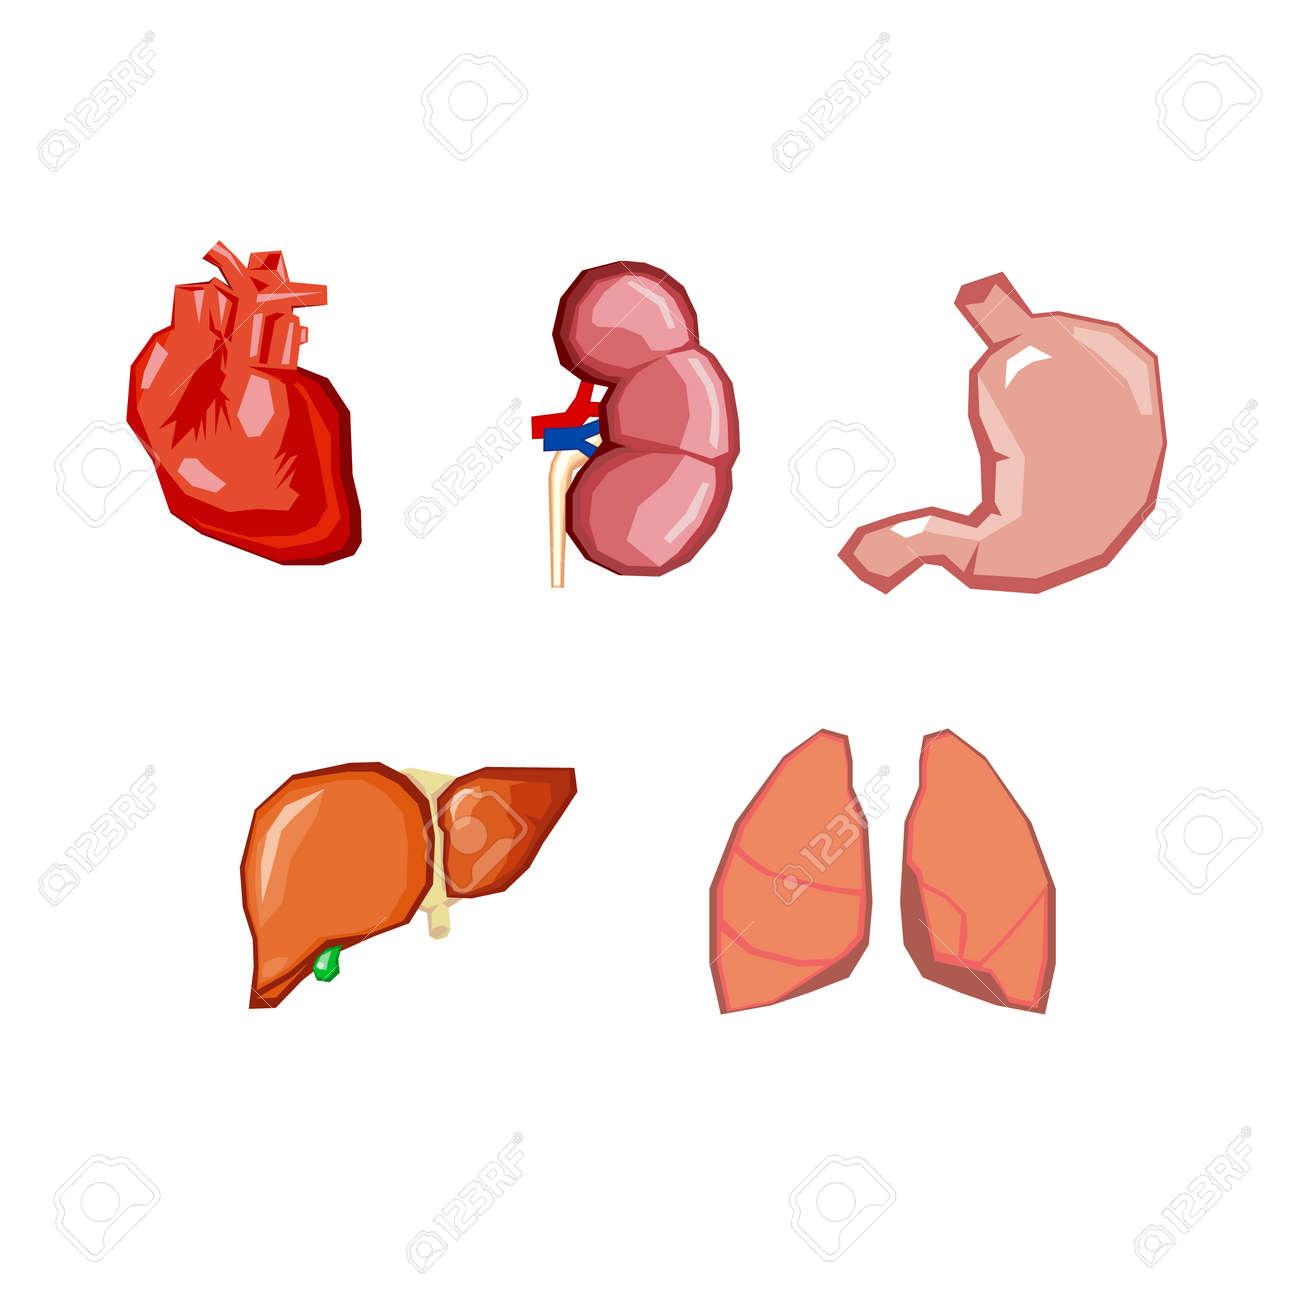 Human Organs Internal Organs Set Human Anatomy Internal Parts